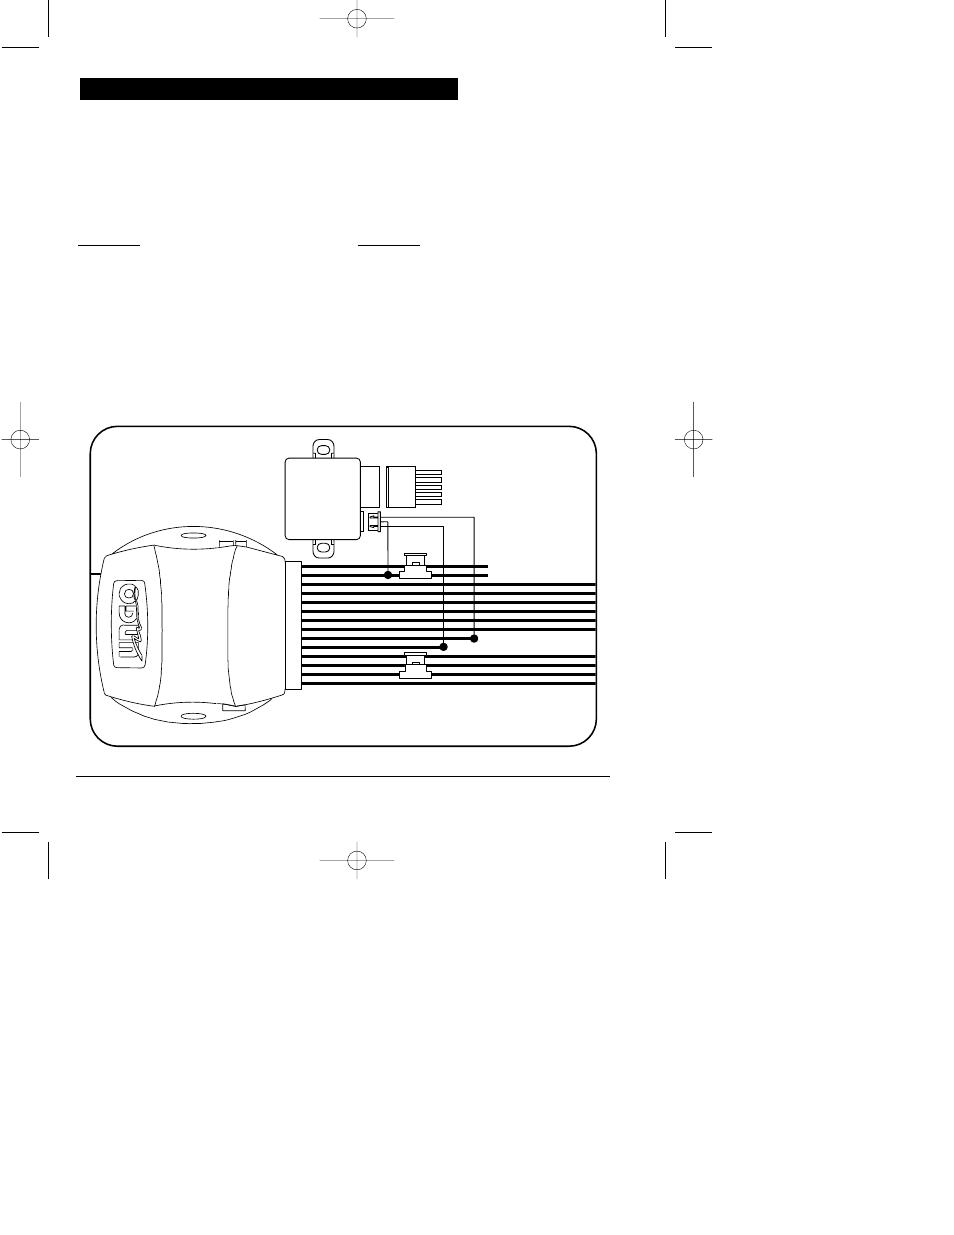 medium resolution of optional dlrm door lock relay module clarion ungo ms3001 user manual page 22 26